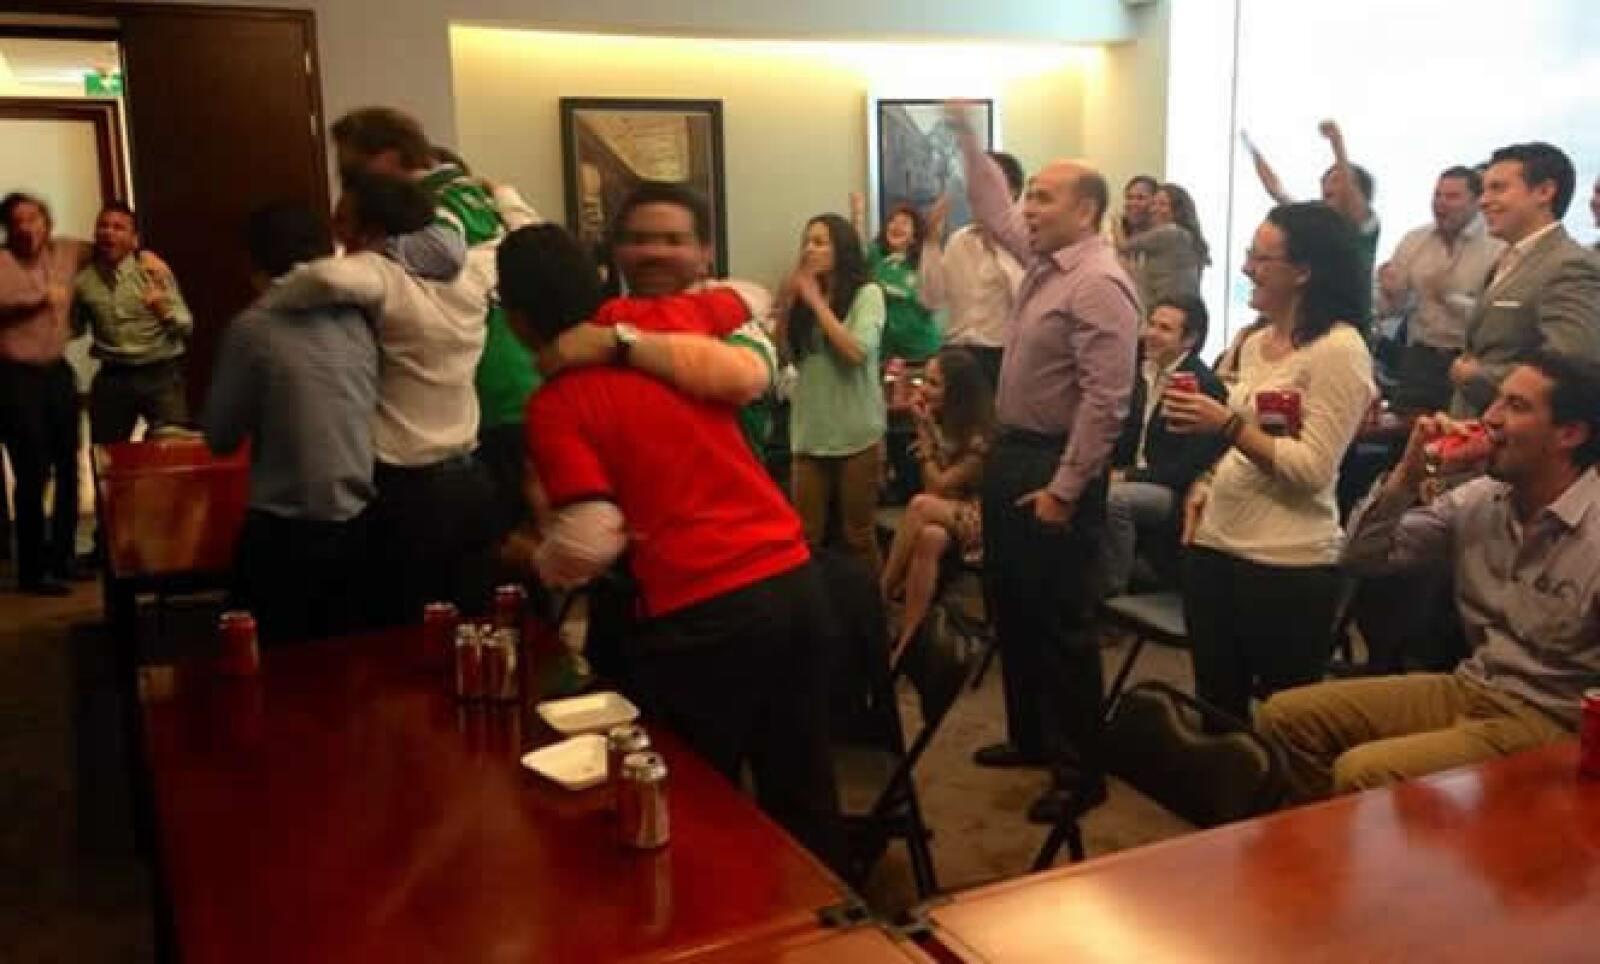 El grito de gol, tras anotar México, se escuchó en calles y oficinas